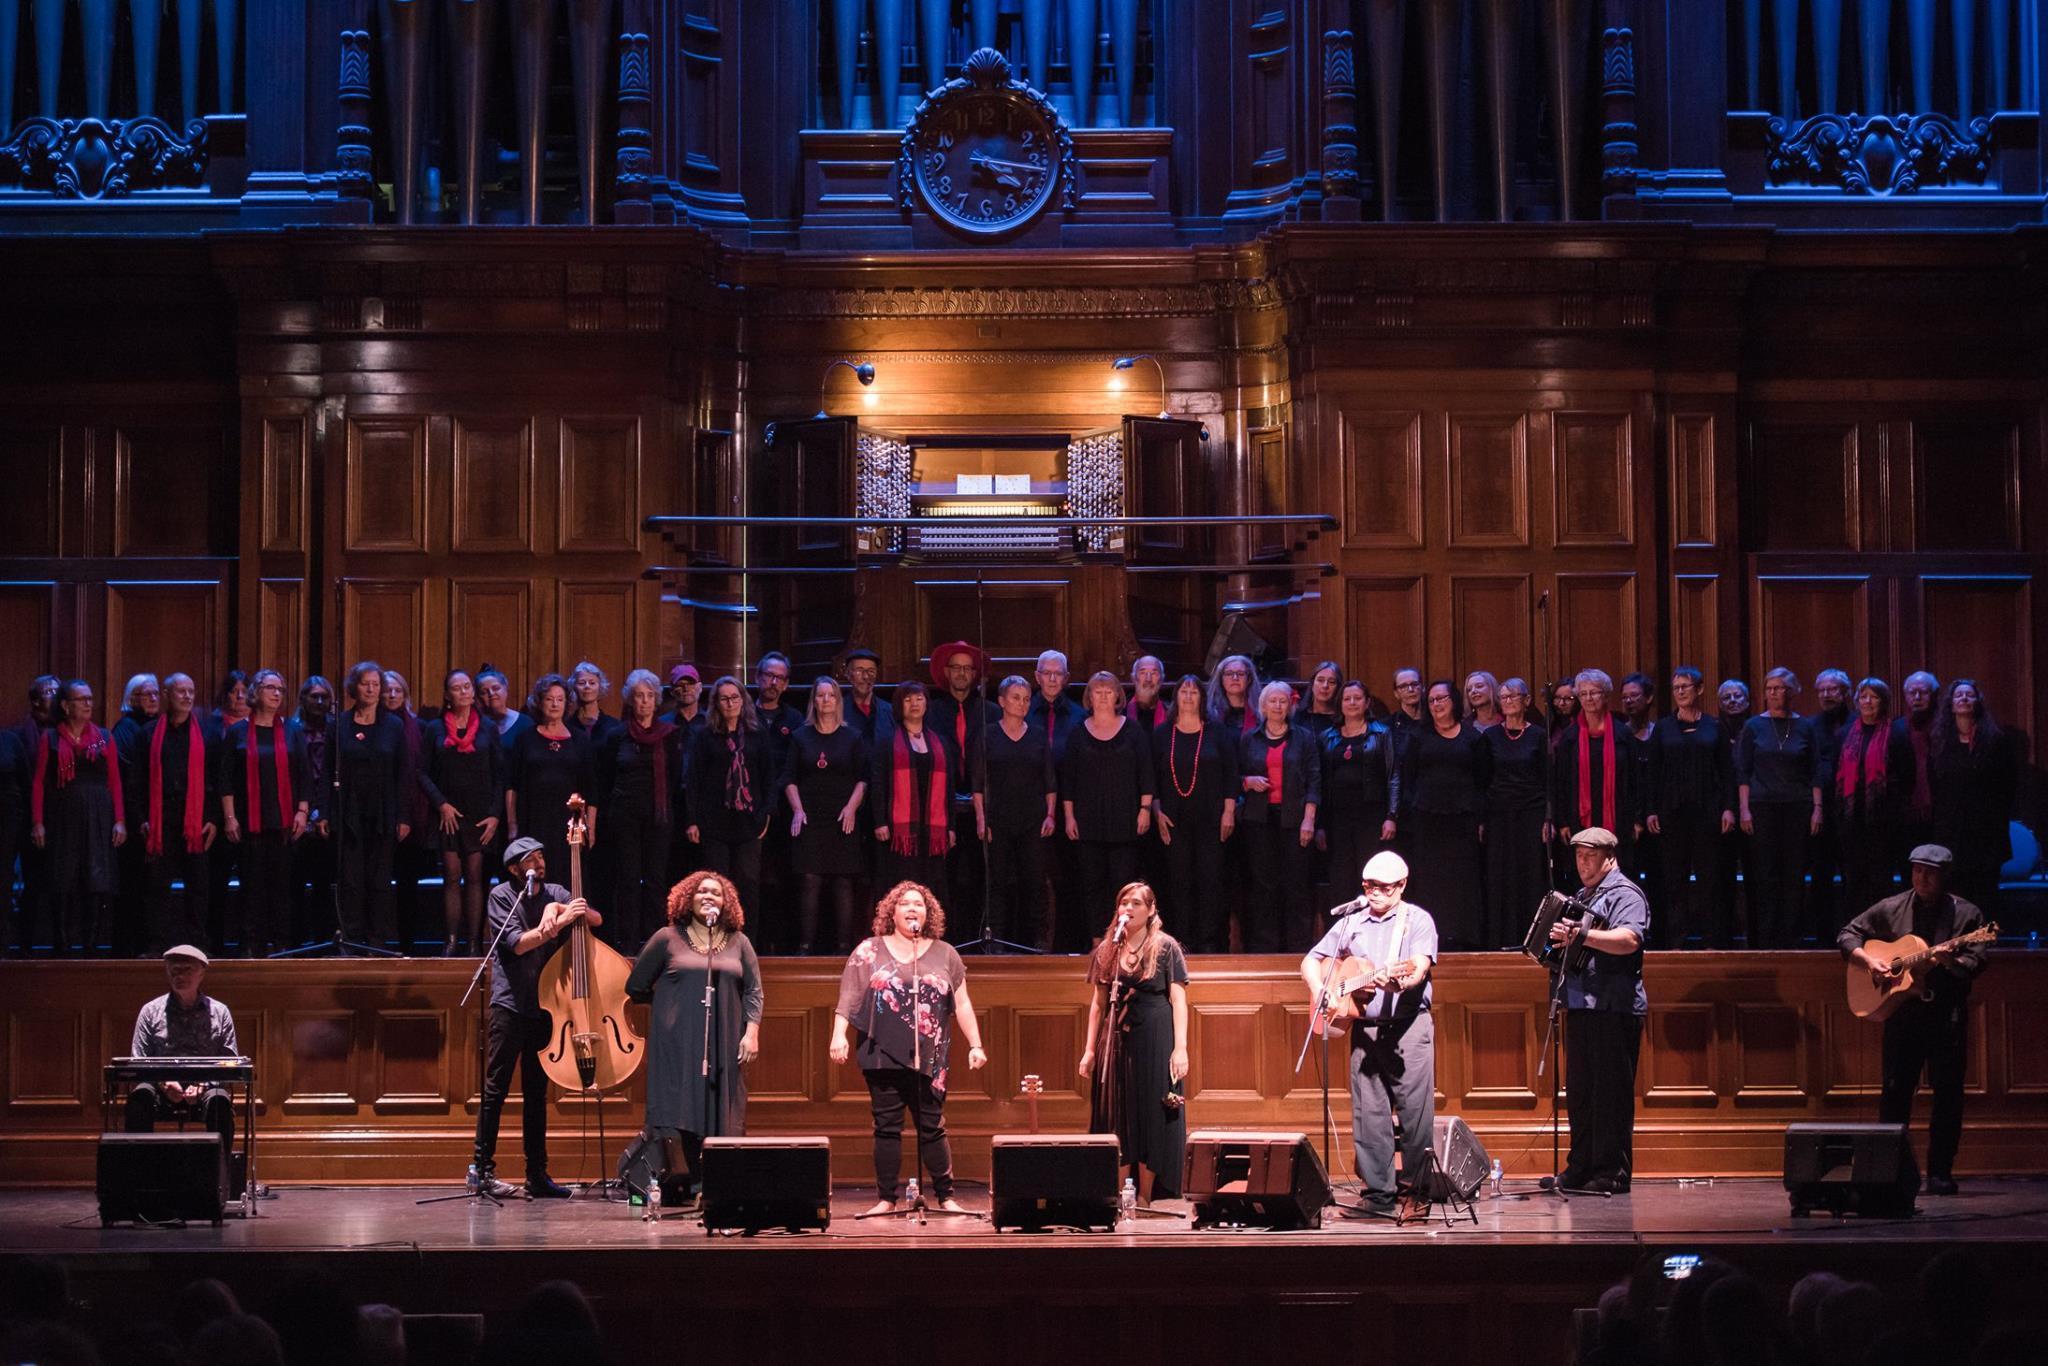 msp-melb-choir.jpg